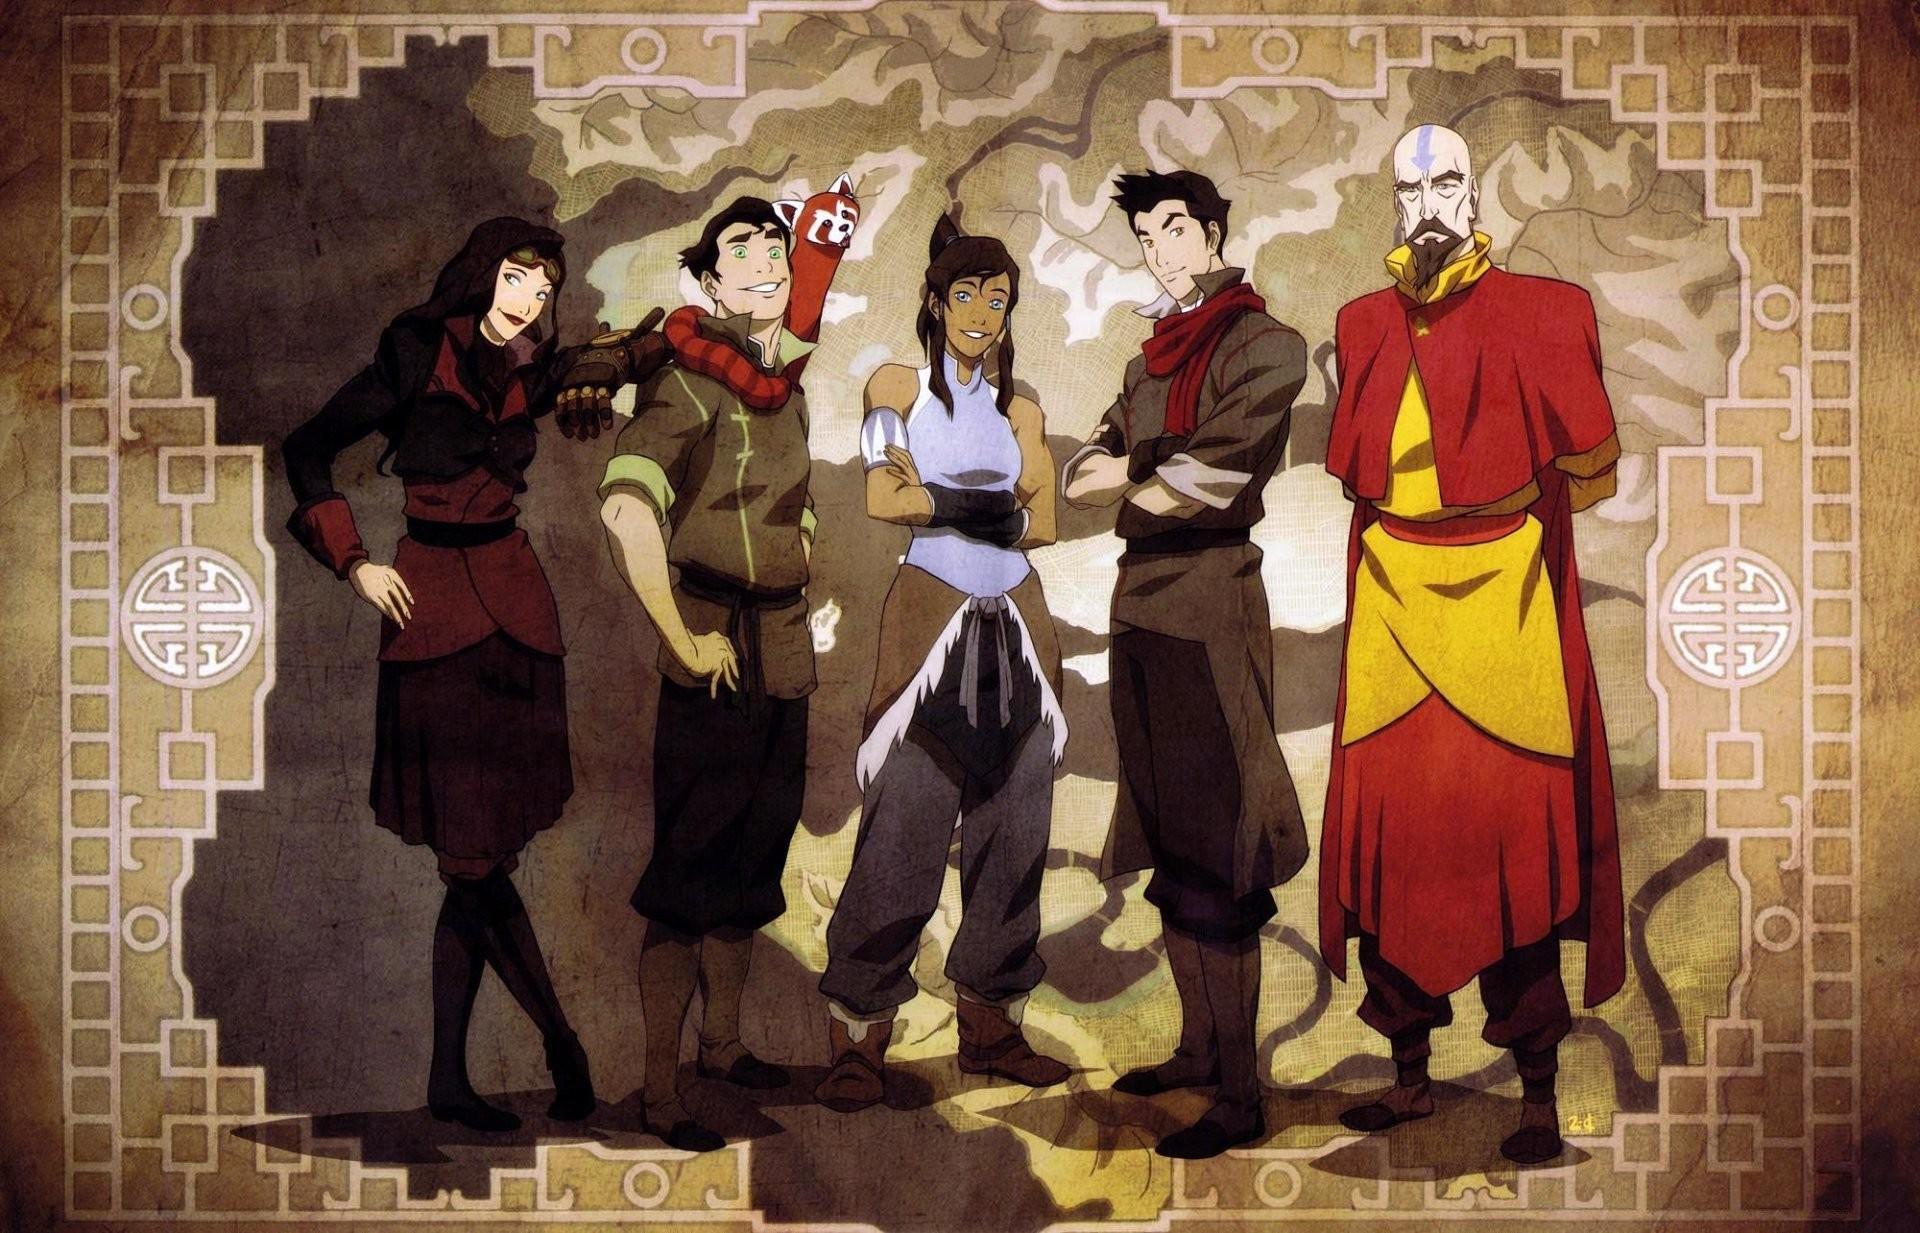 the legend of korra avatar: the legend of korra korra avatar avatar asami  sato bolin